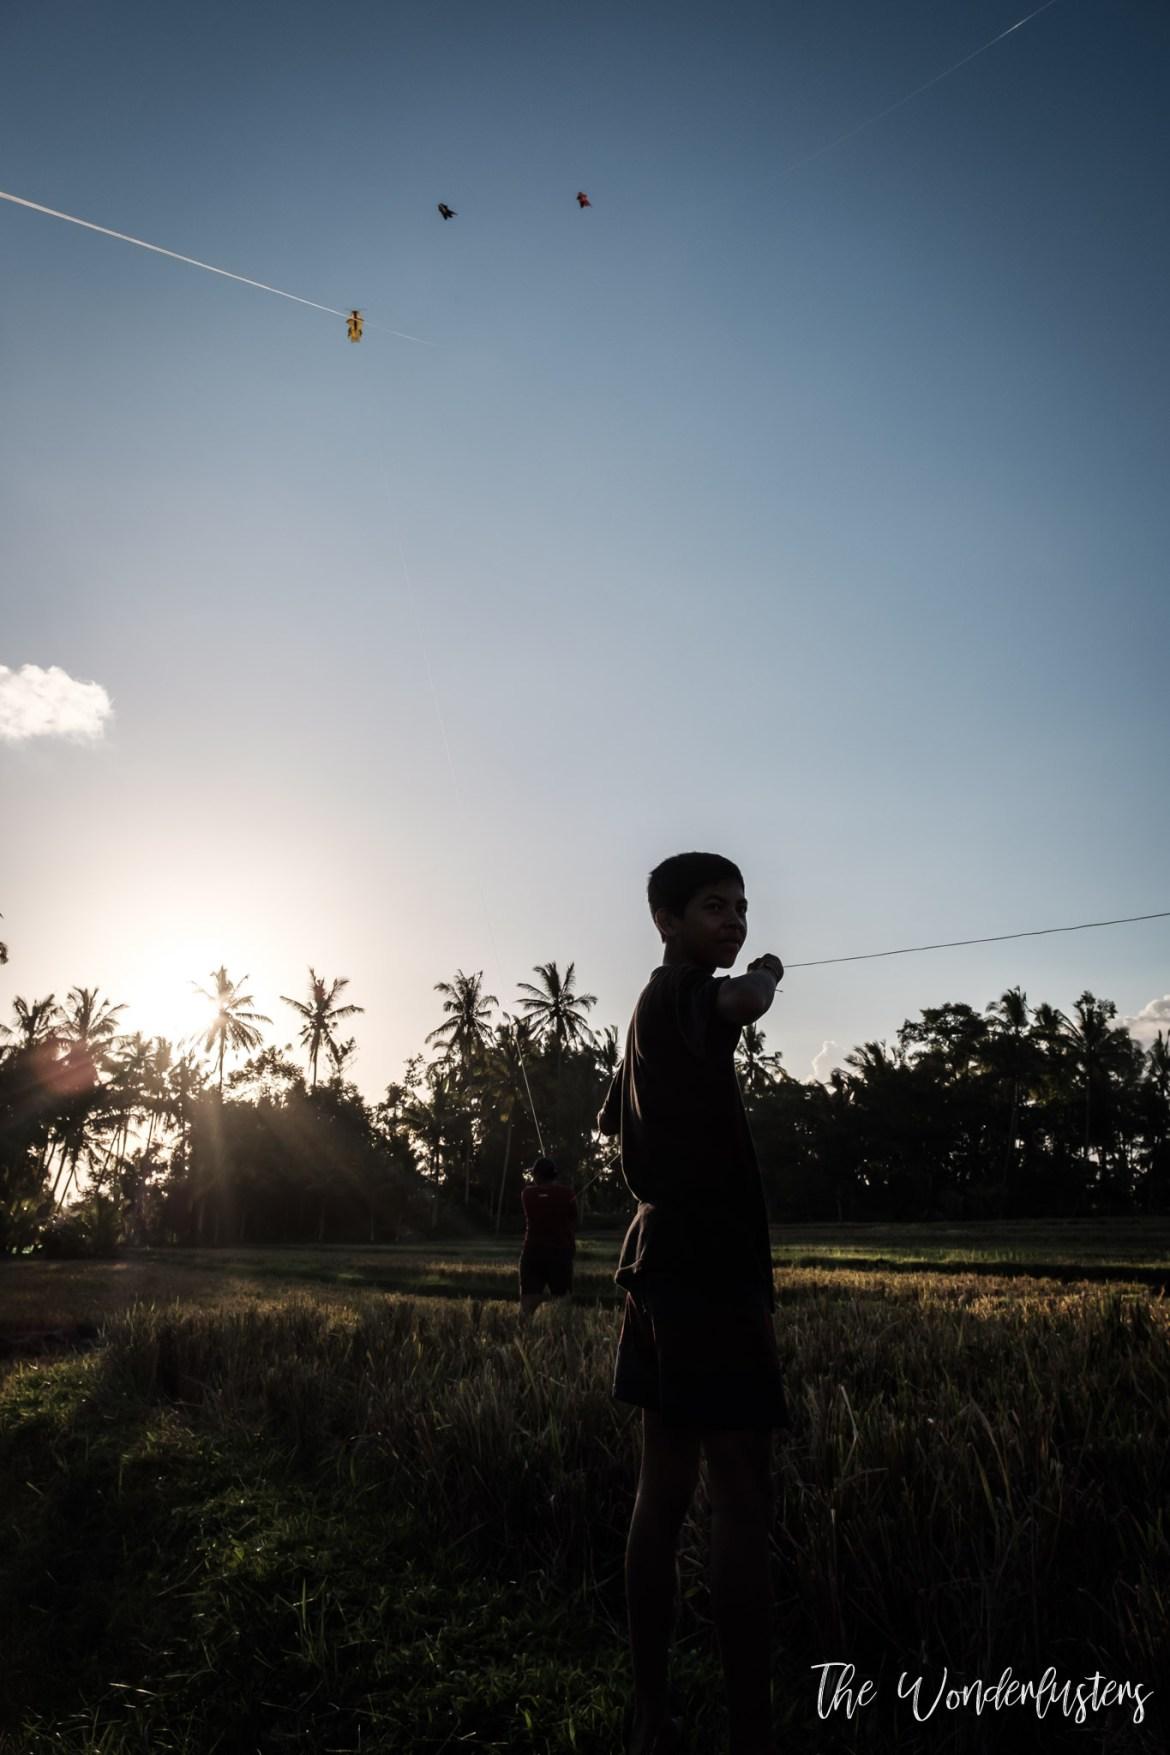 Kite Flying in Ubud